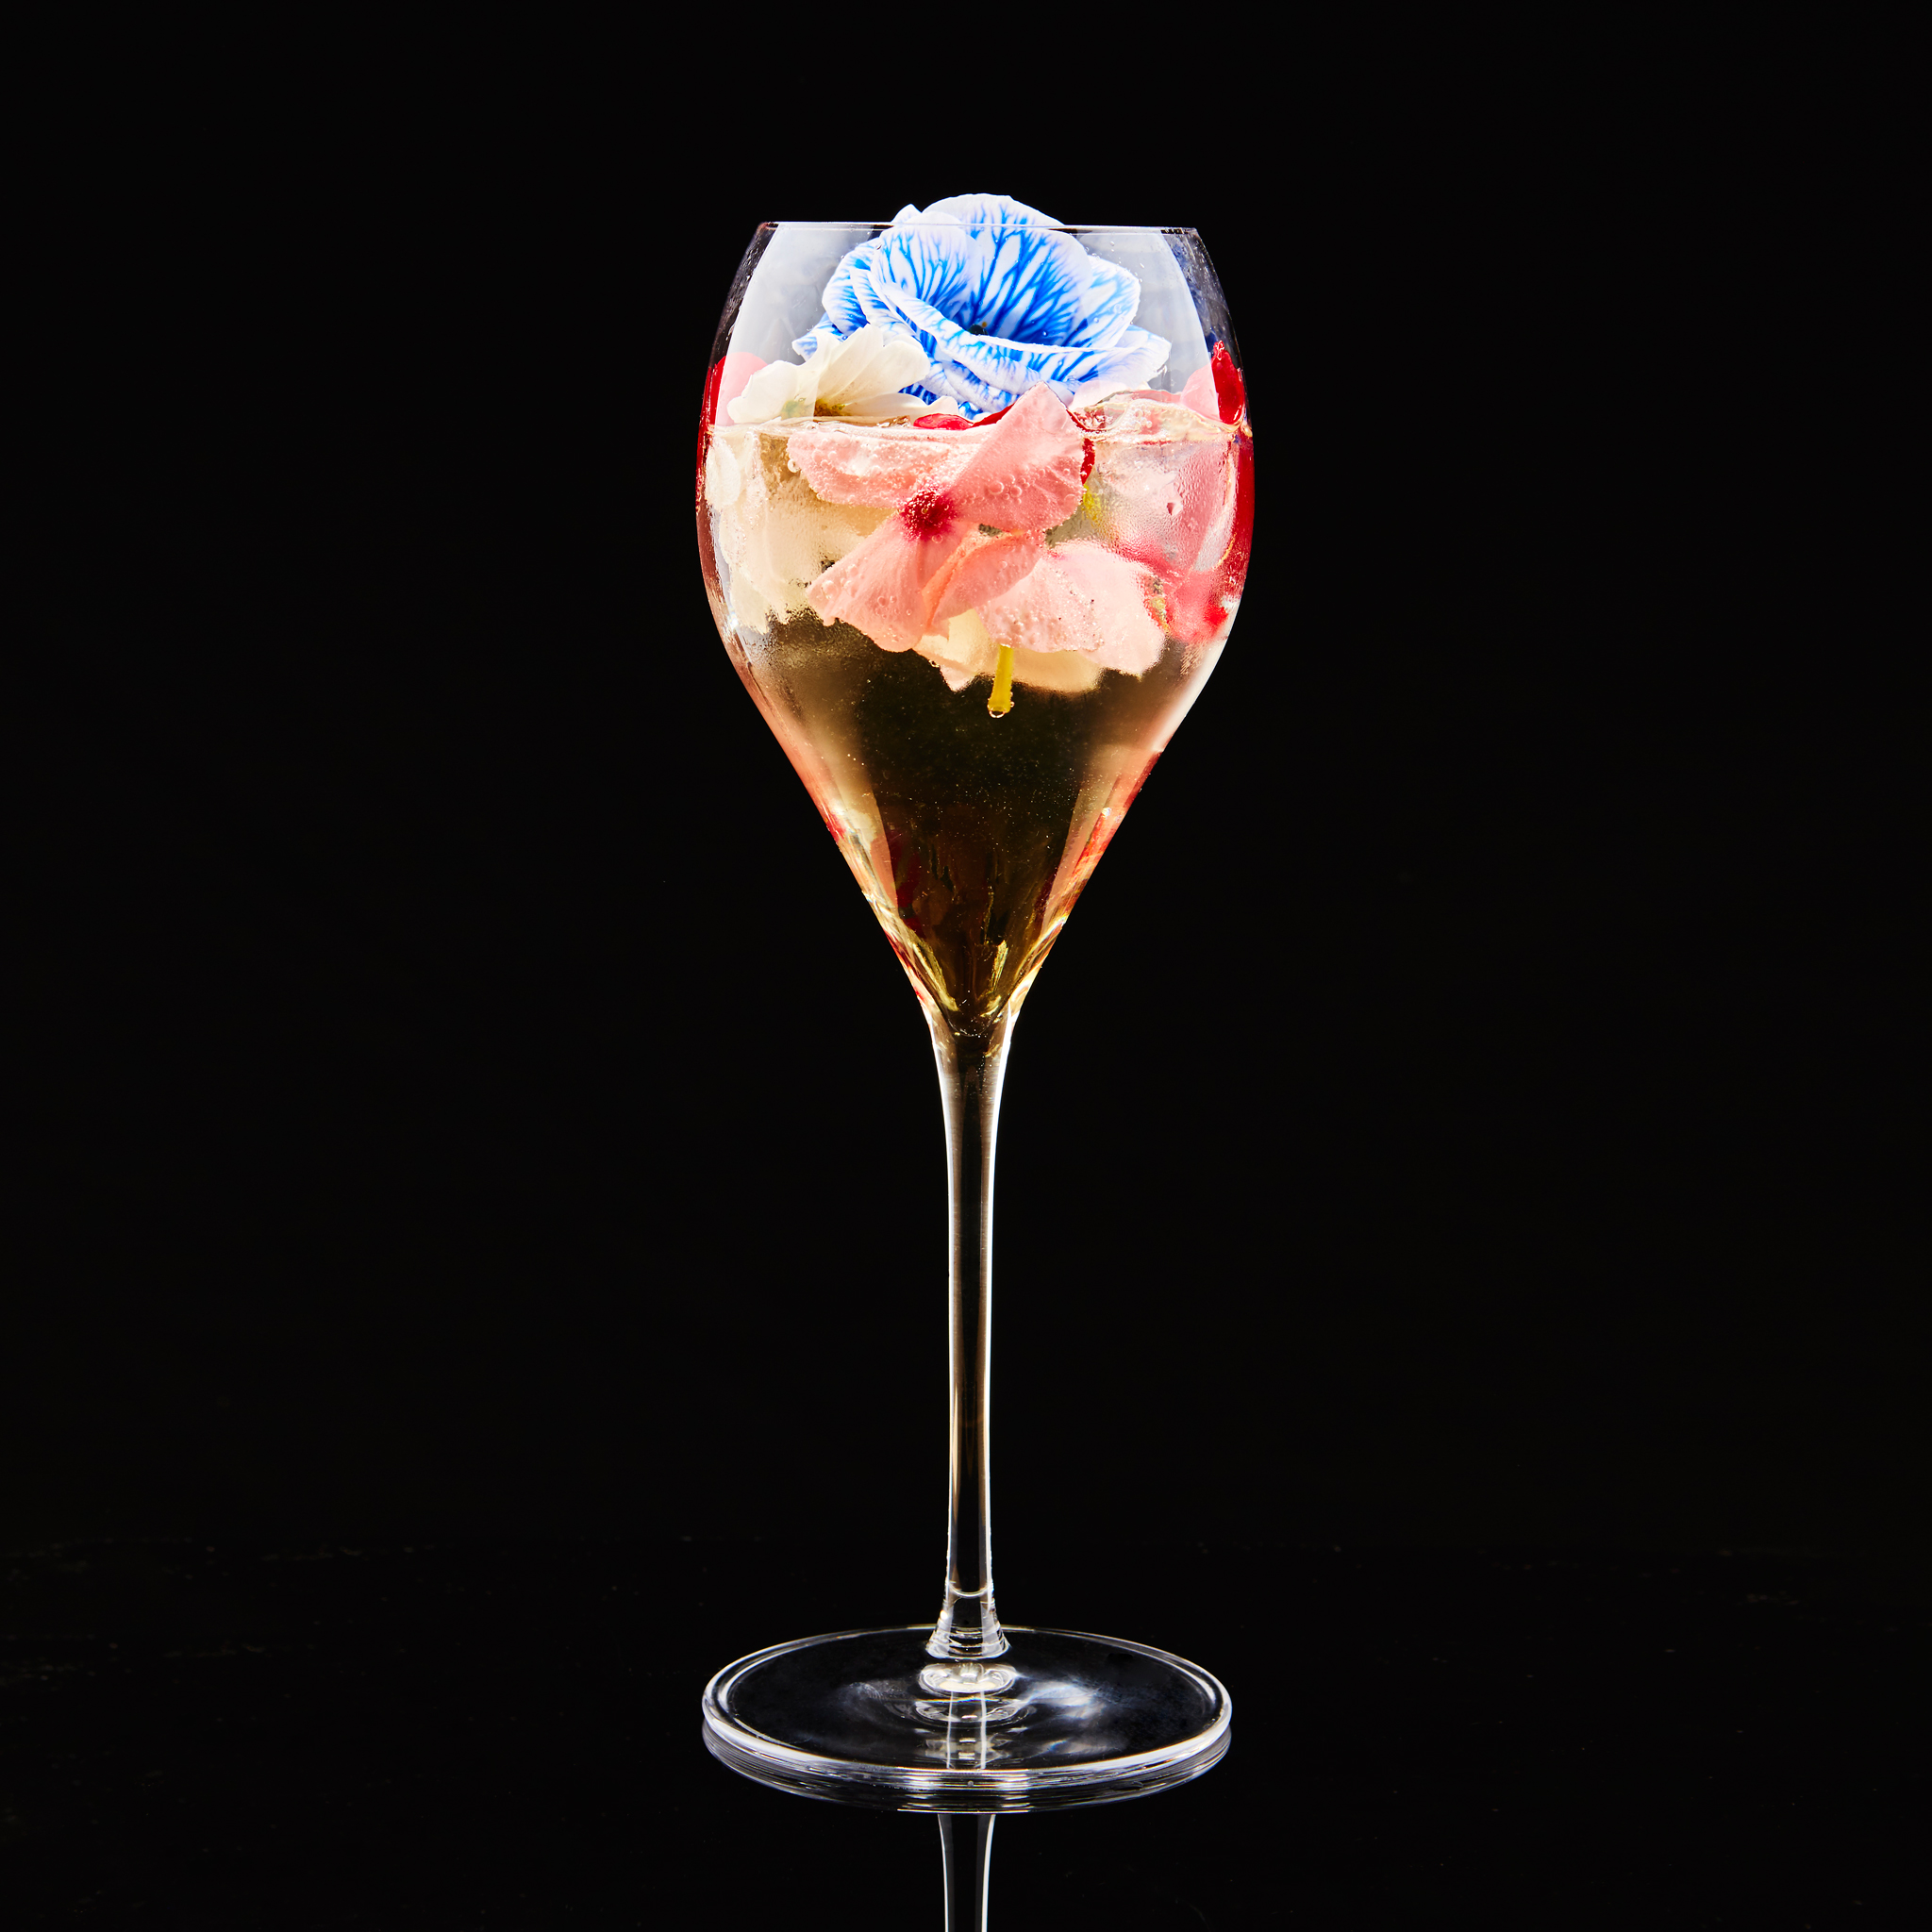 Van_gogh_fabio_camboni_bartender (3)